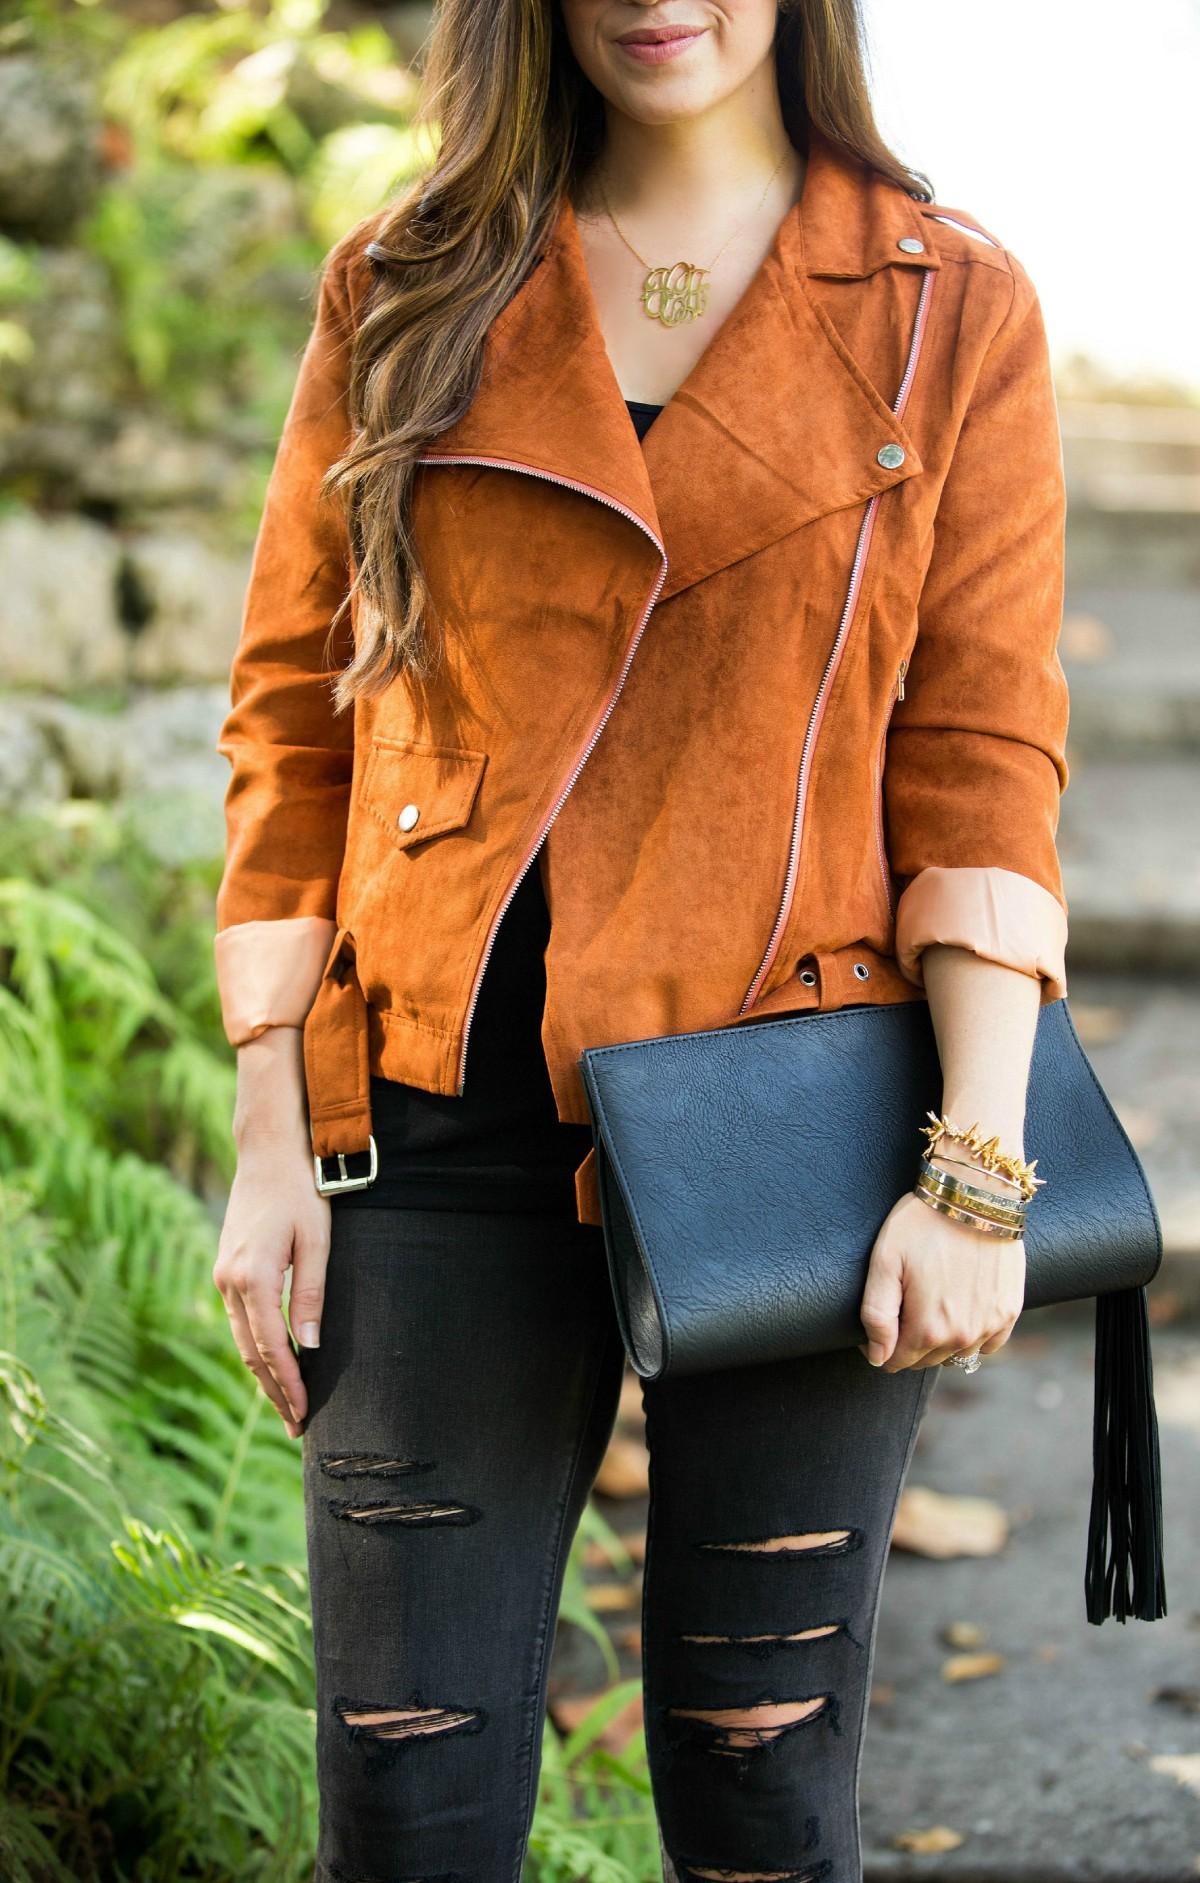 cool street style inspo, fashion blogger style, New York style, Jaime Cittadino